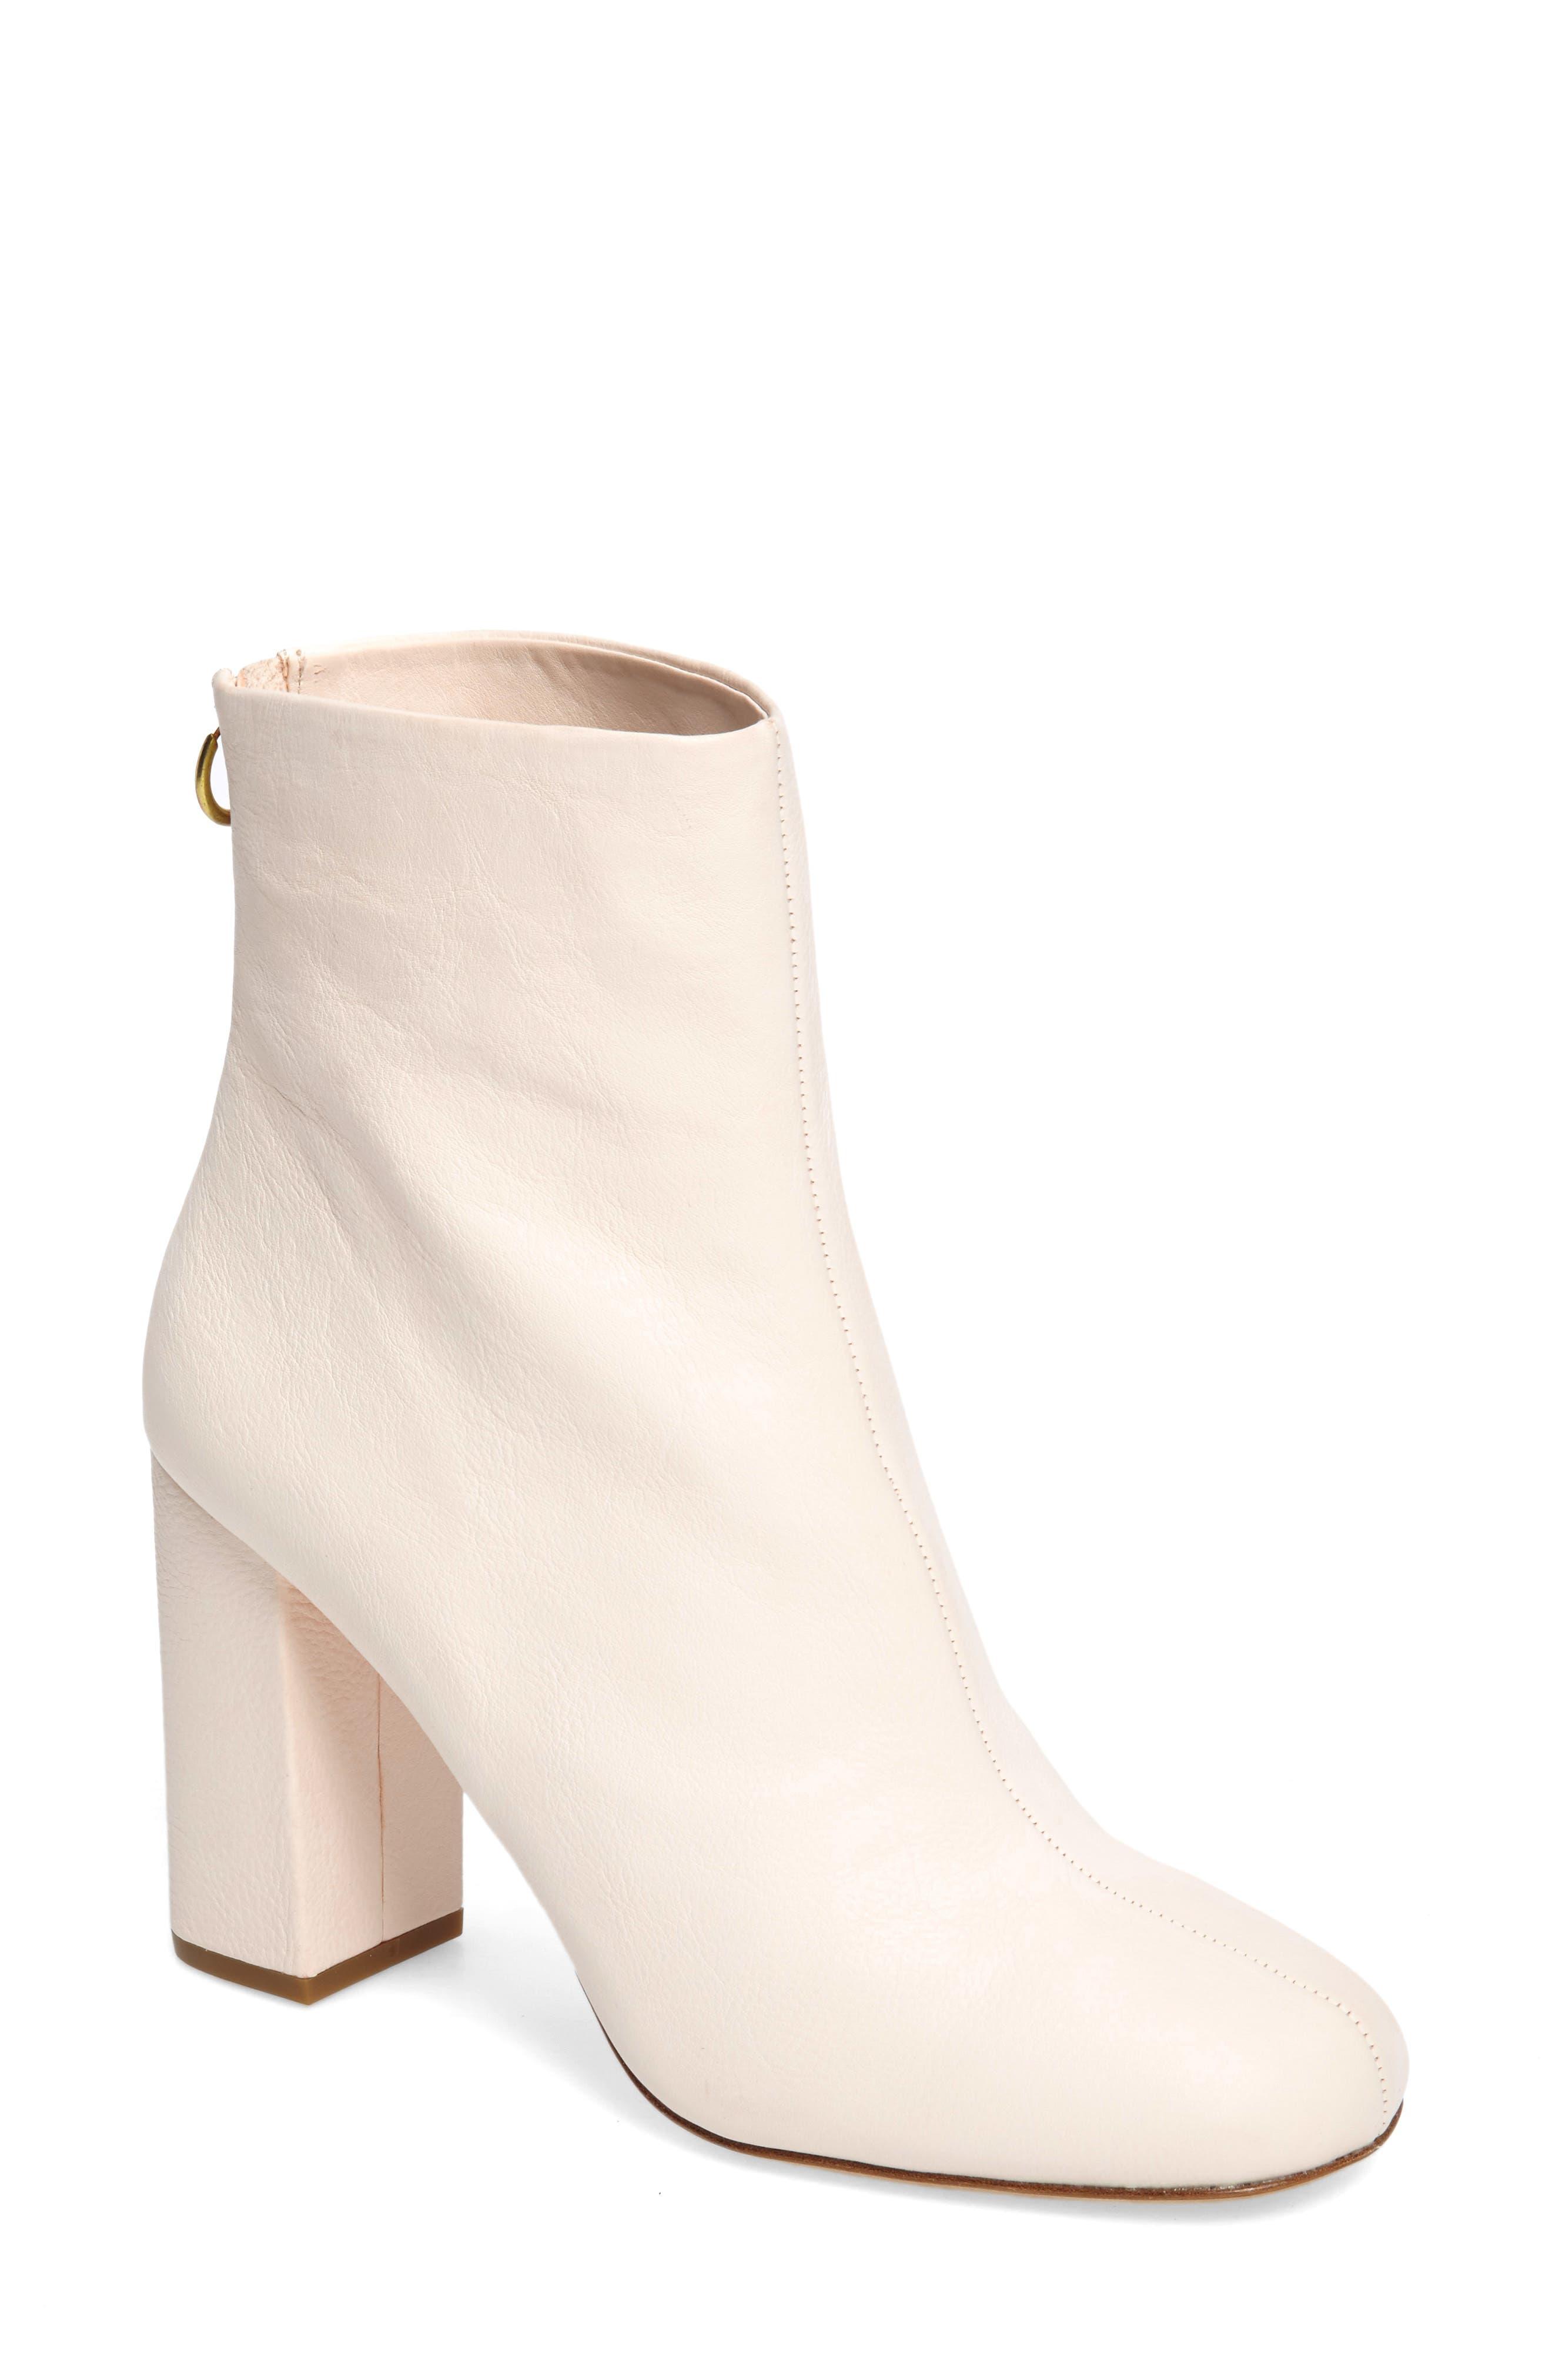 White Bootie Heels o3tvYJSL